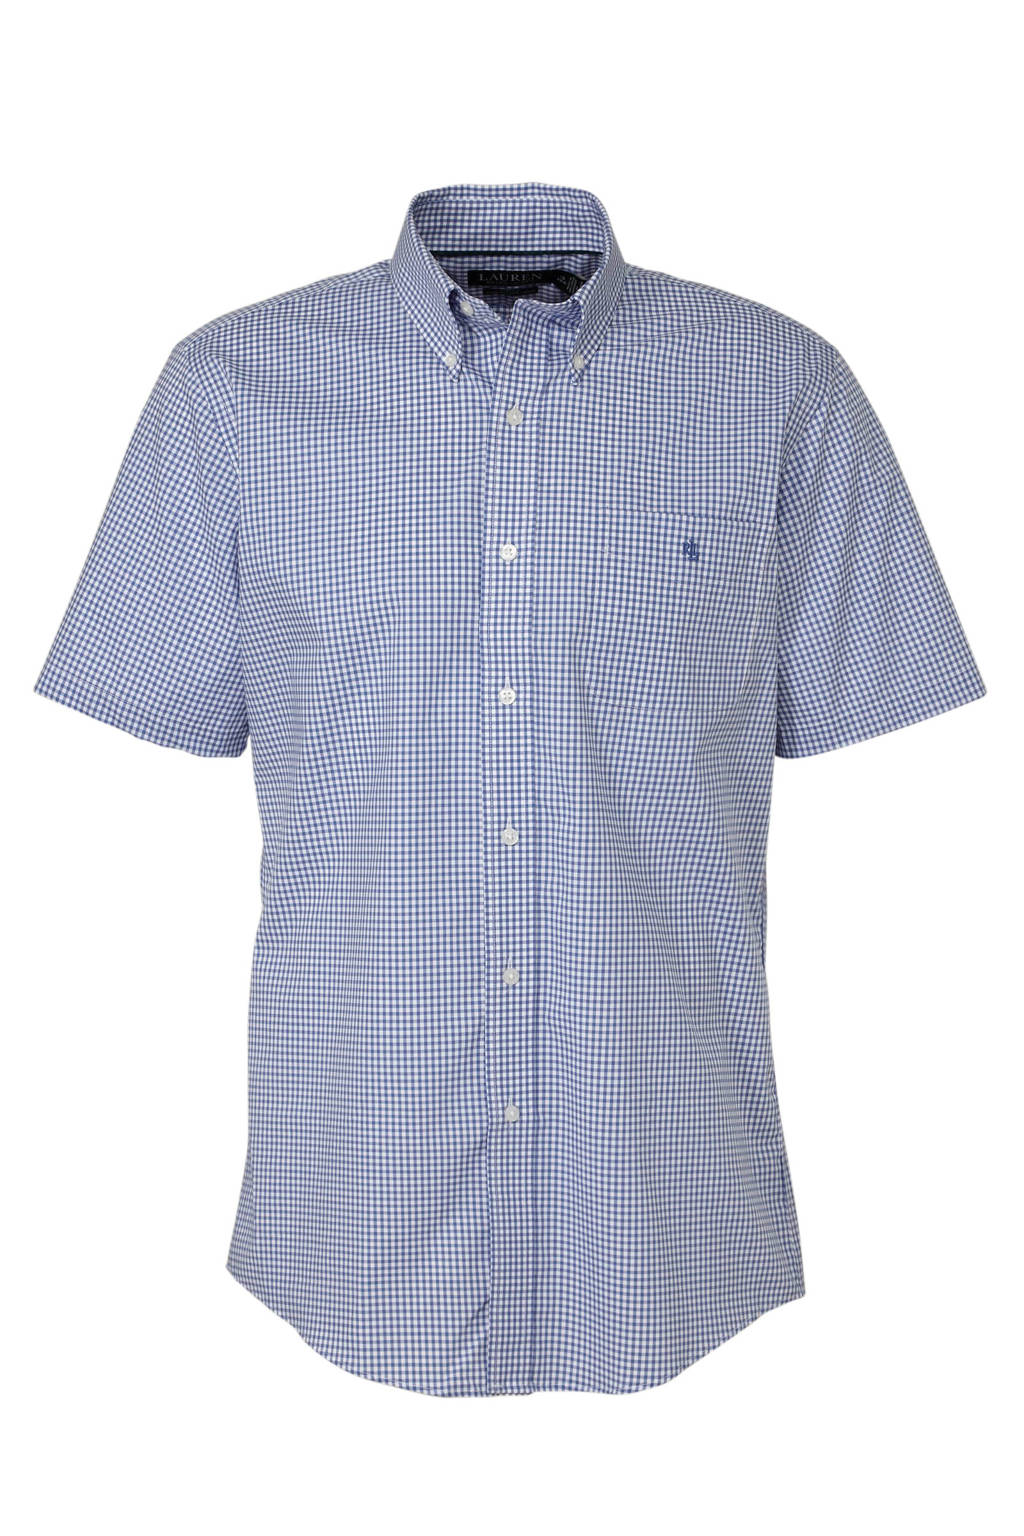 POLO Ralph Lauren geruit regular fit overhemd blauw, Blauw